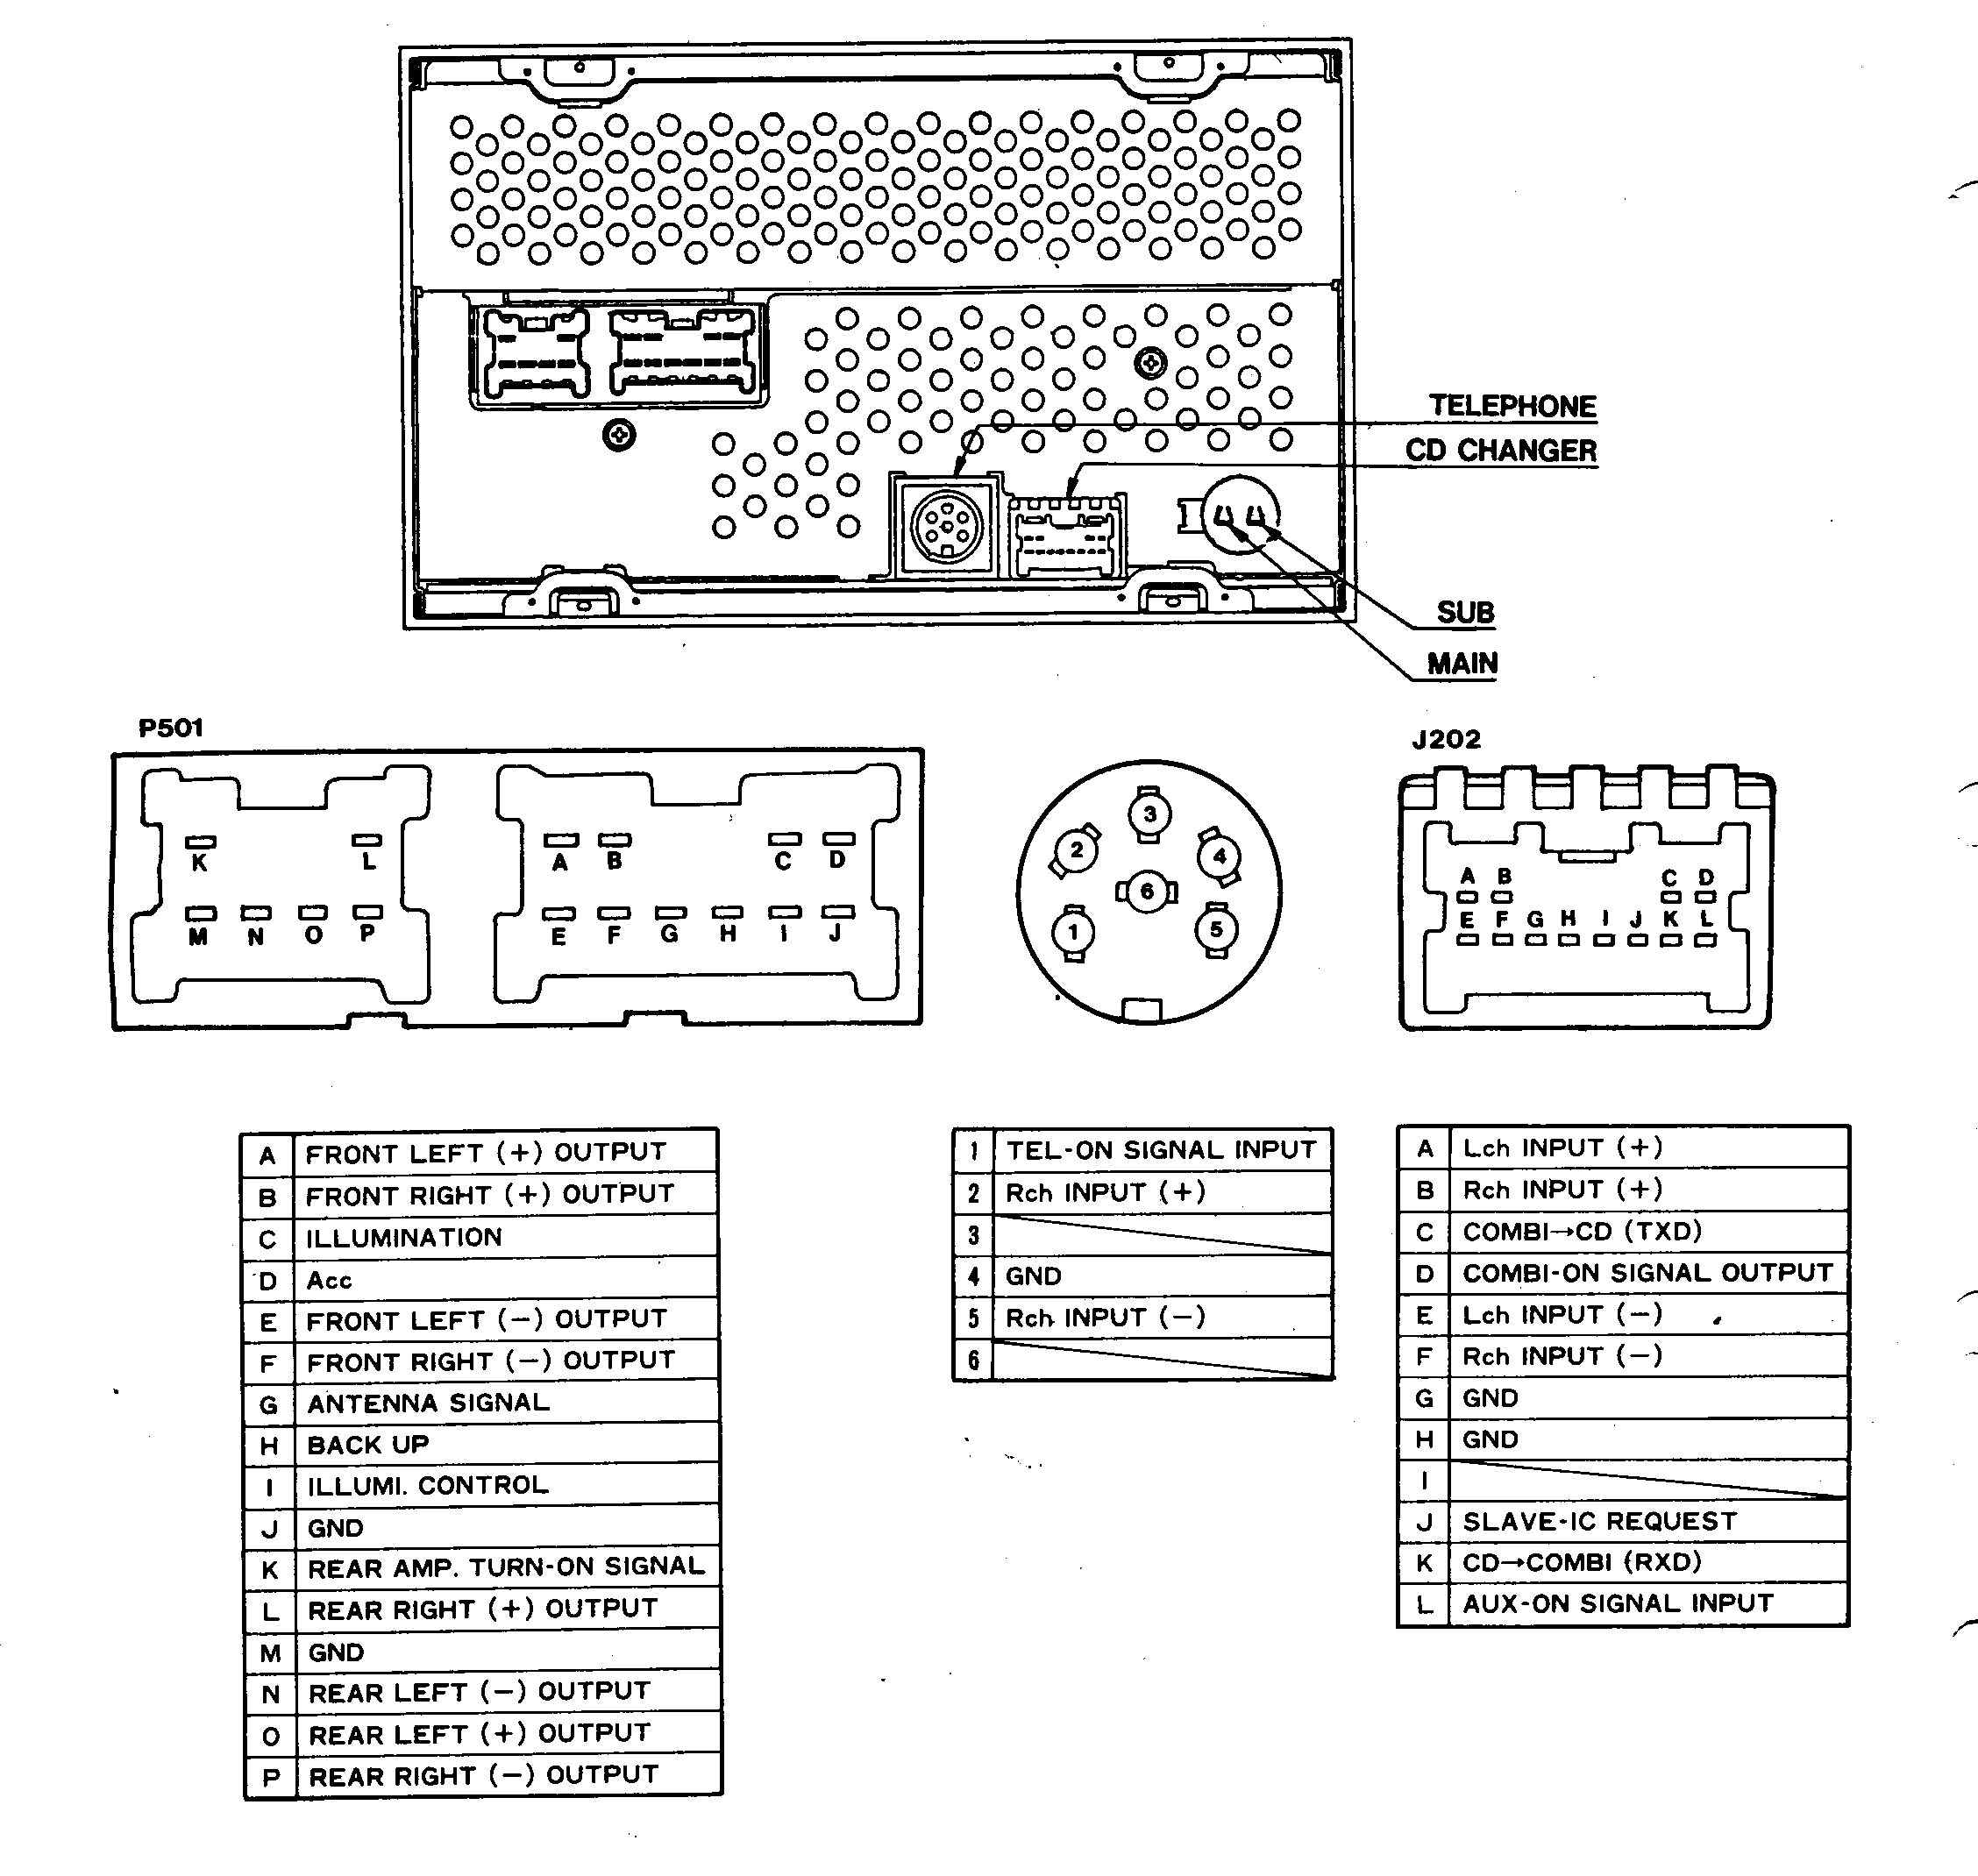 2012 Nissan Radio Wiring Harness Diagram - Wiring Diagram Data - 2006 Chevy Silverado Radio Wiring Diagram